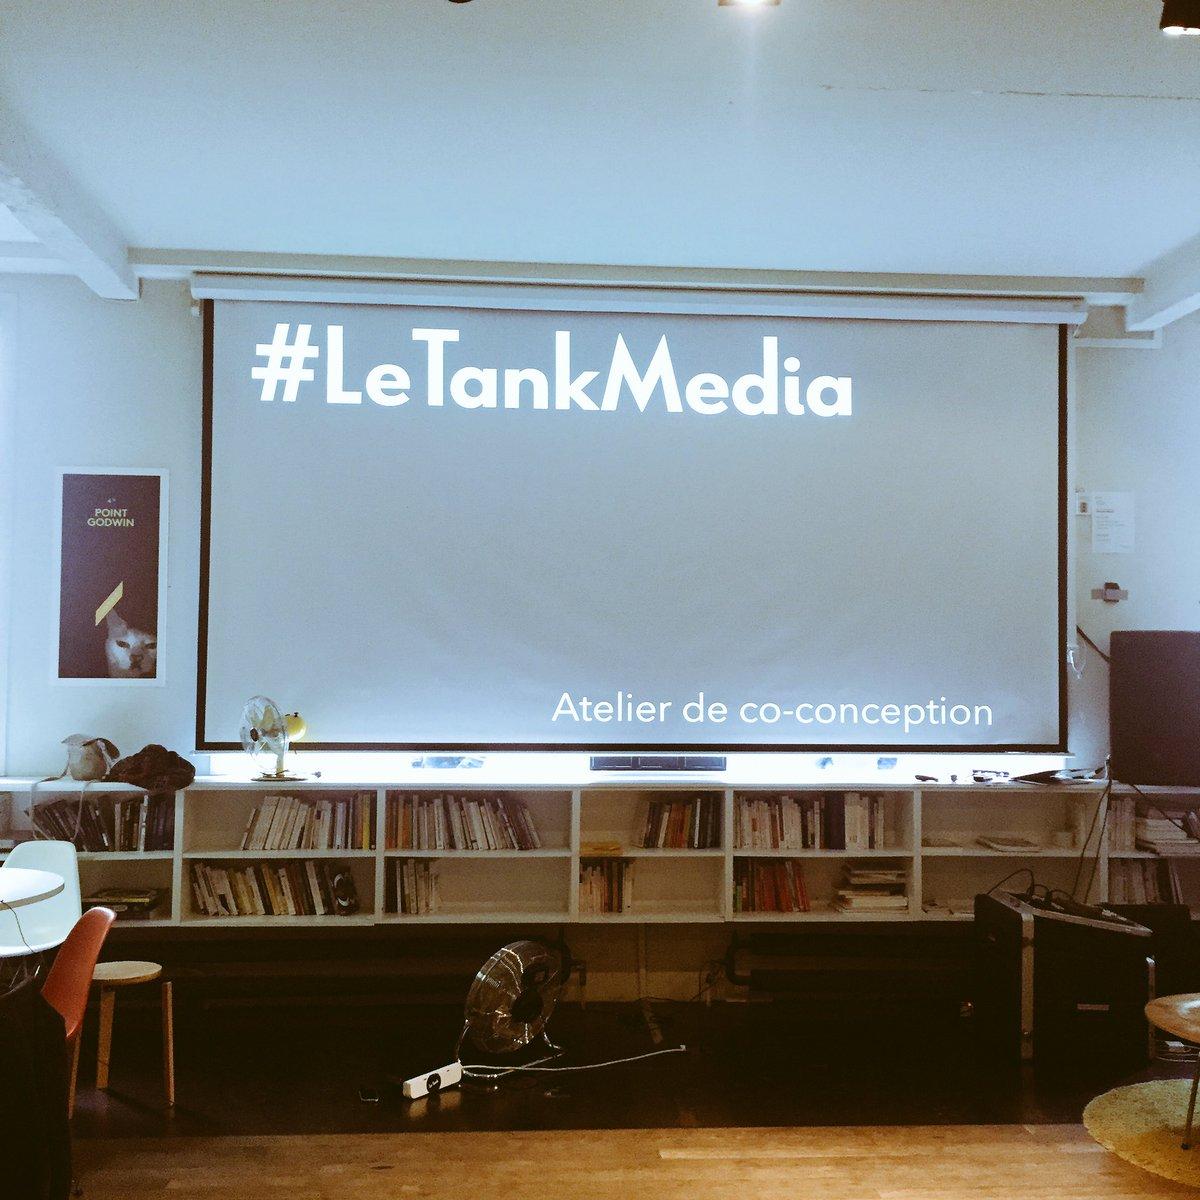 atelier co-conception #LeTankMedia @letankmedia #futureofmedia #futureofwork #media #entrepreneuriat #intrapreneuriat  #incubateur #medias<br>http://pic.twitter.com/rqwyx1Hb0S